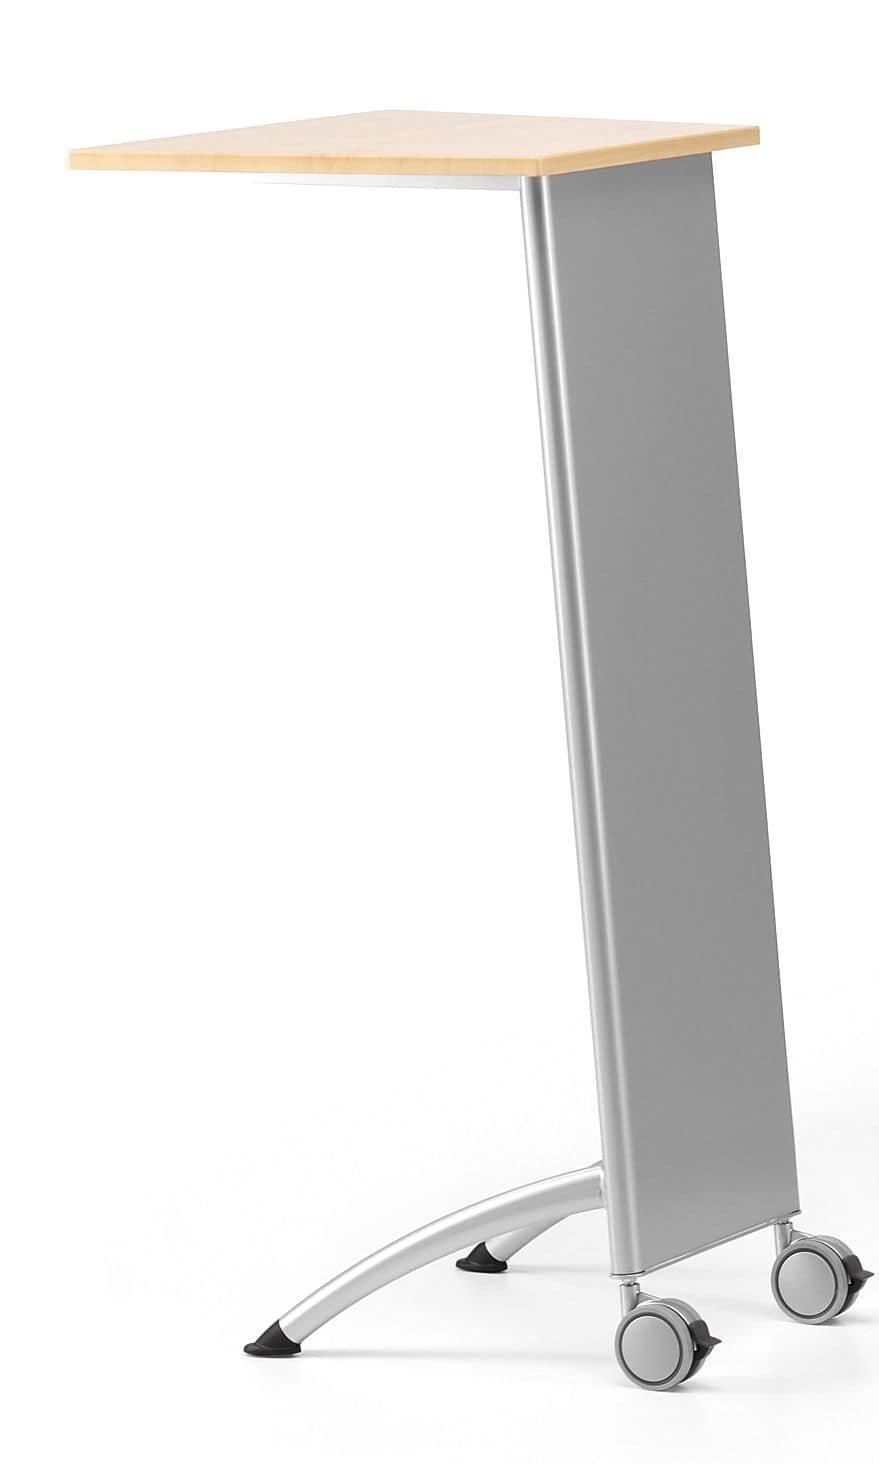 MULTIKOM 3002, Lectern on wheels, metal base and laminate top